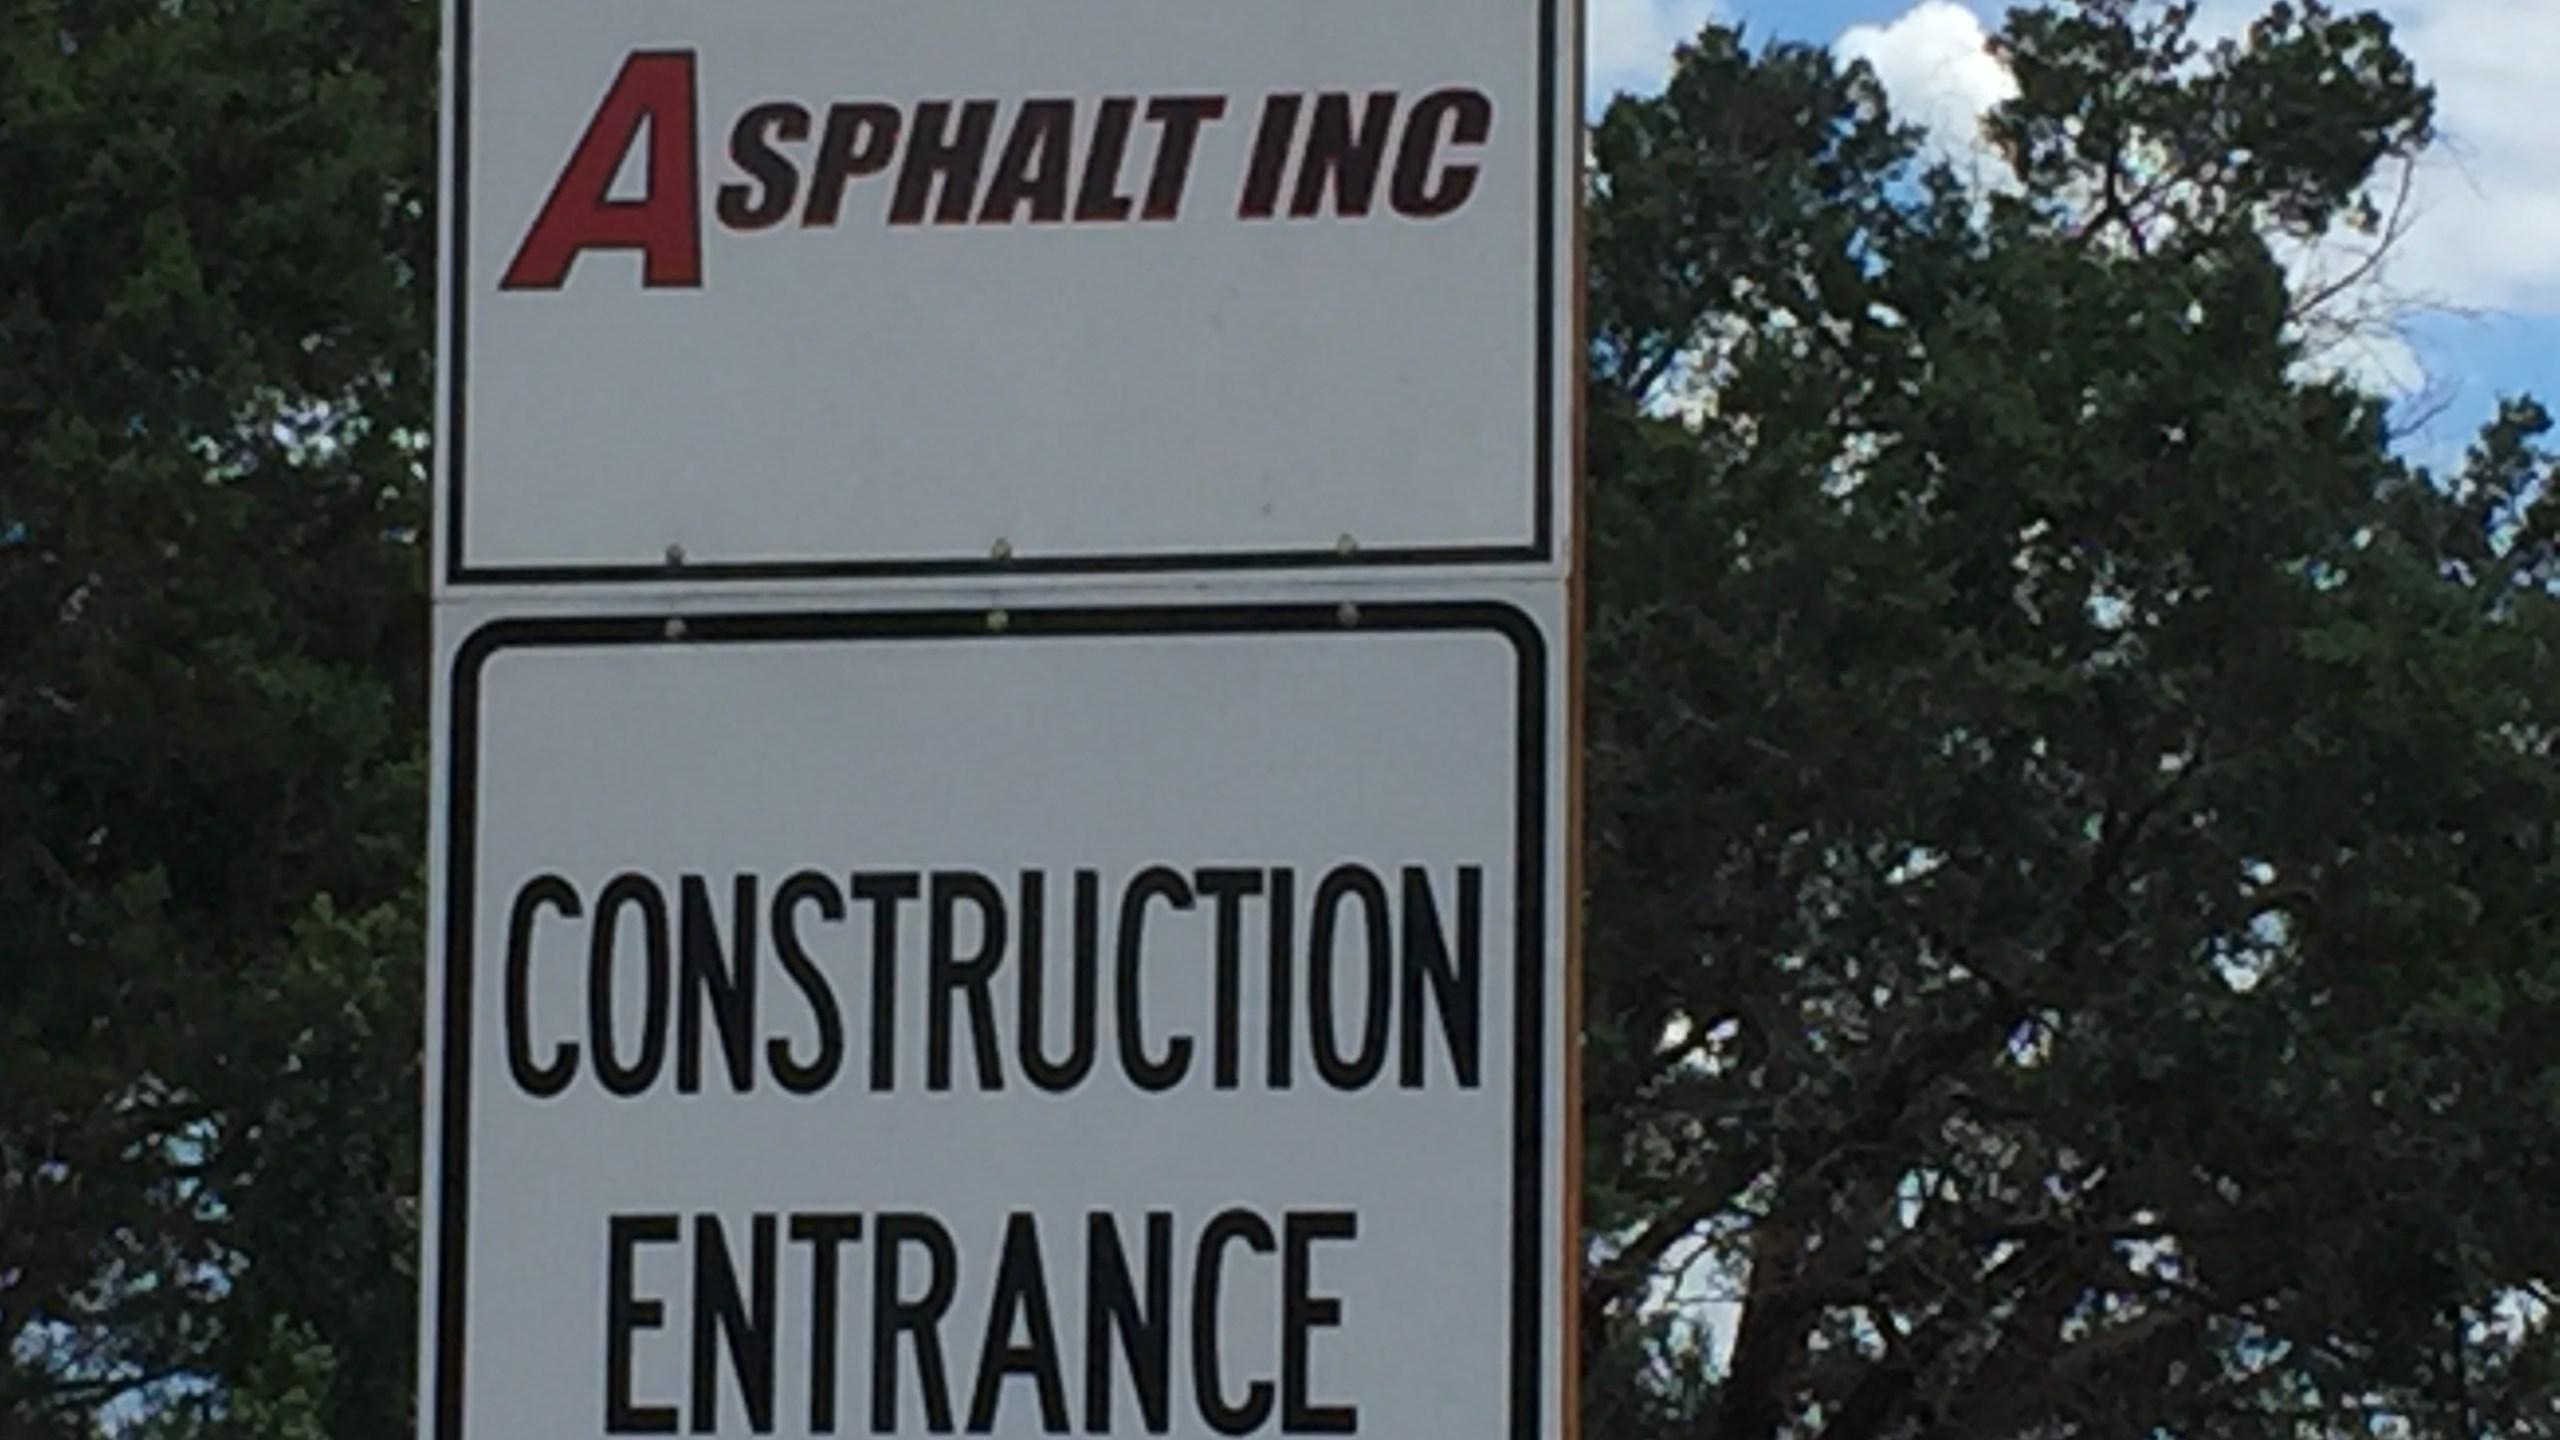 Exterior sign at Asphalt Inc., a hot-mix asphalt plant in Spicewood, Burnet County._295749